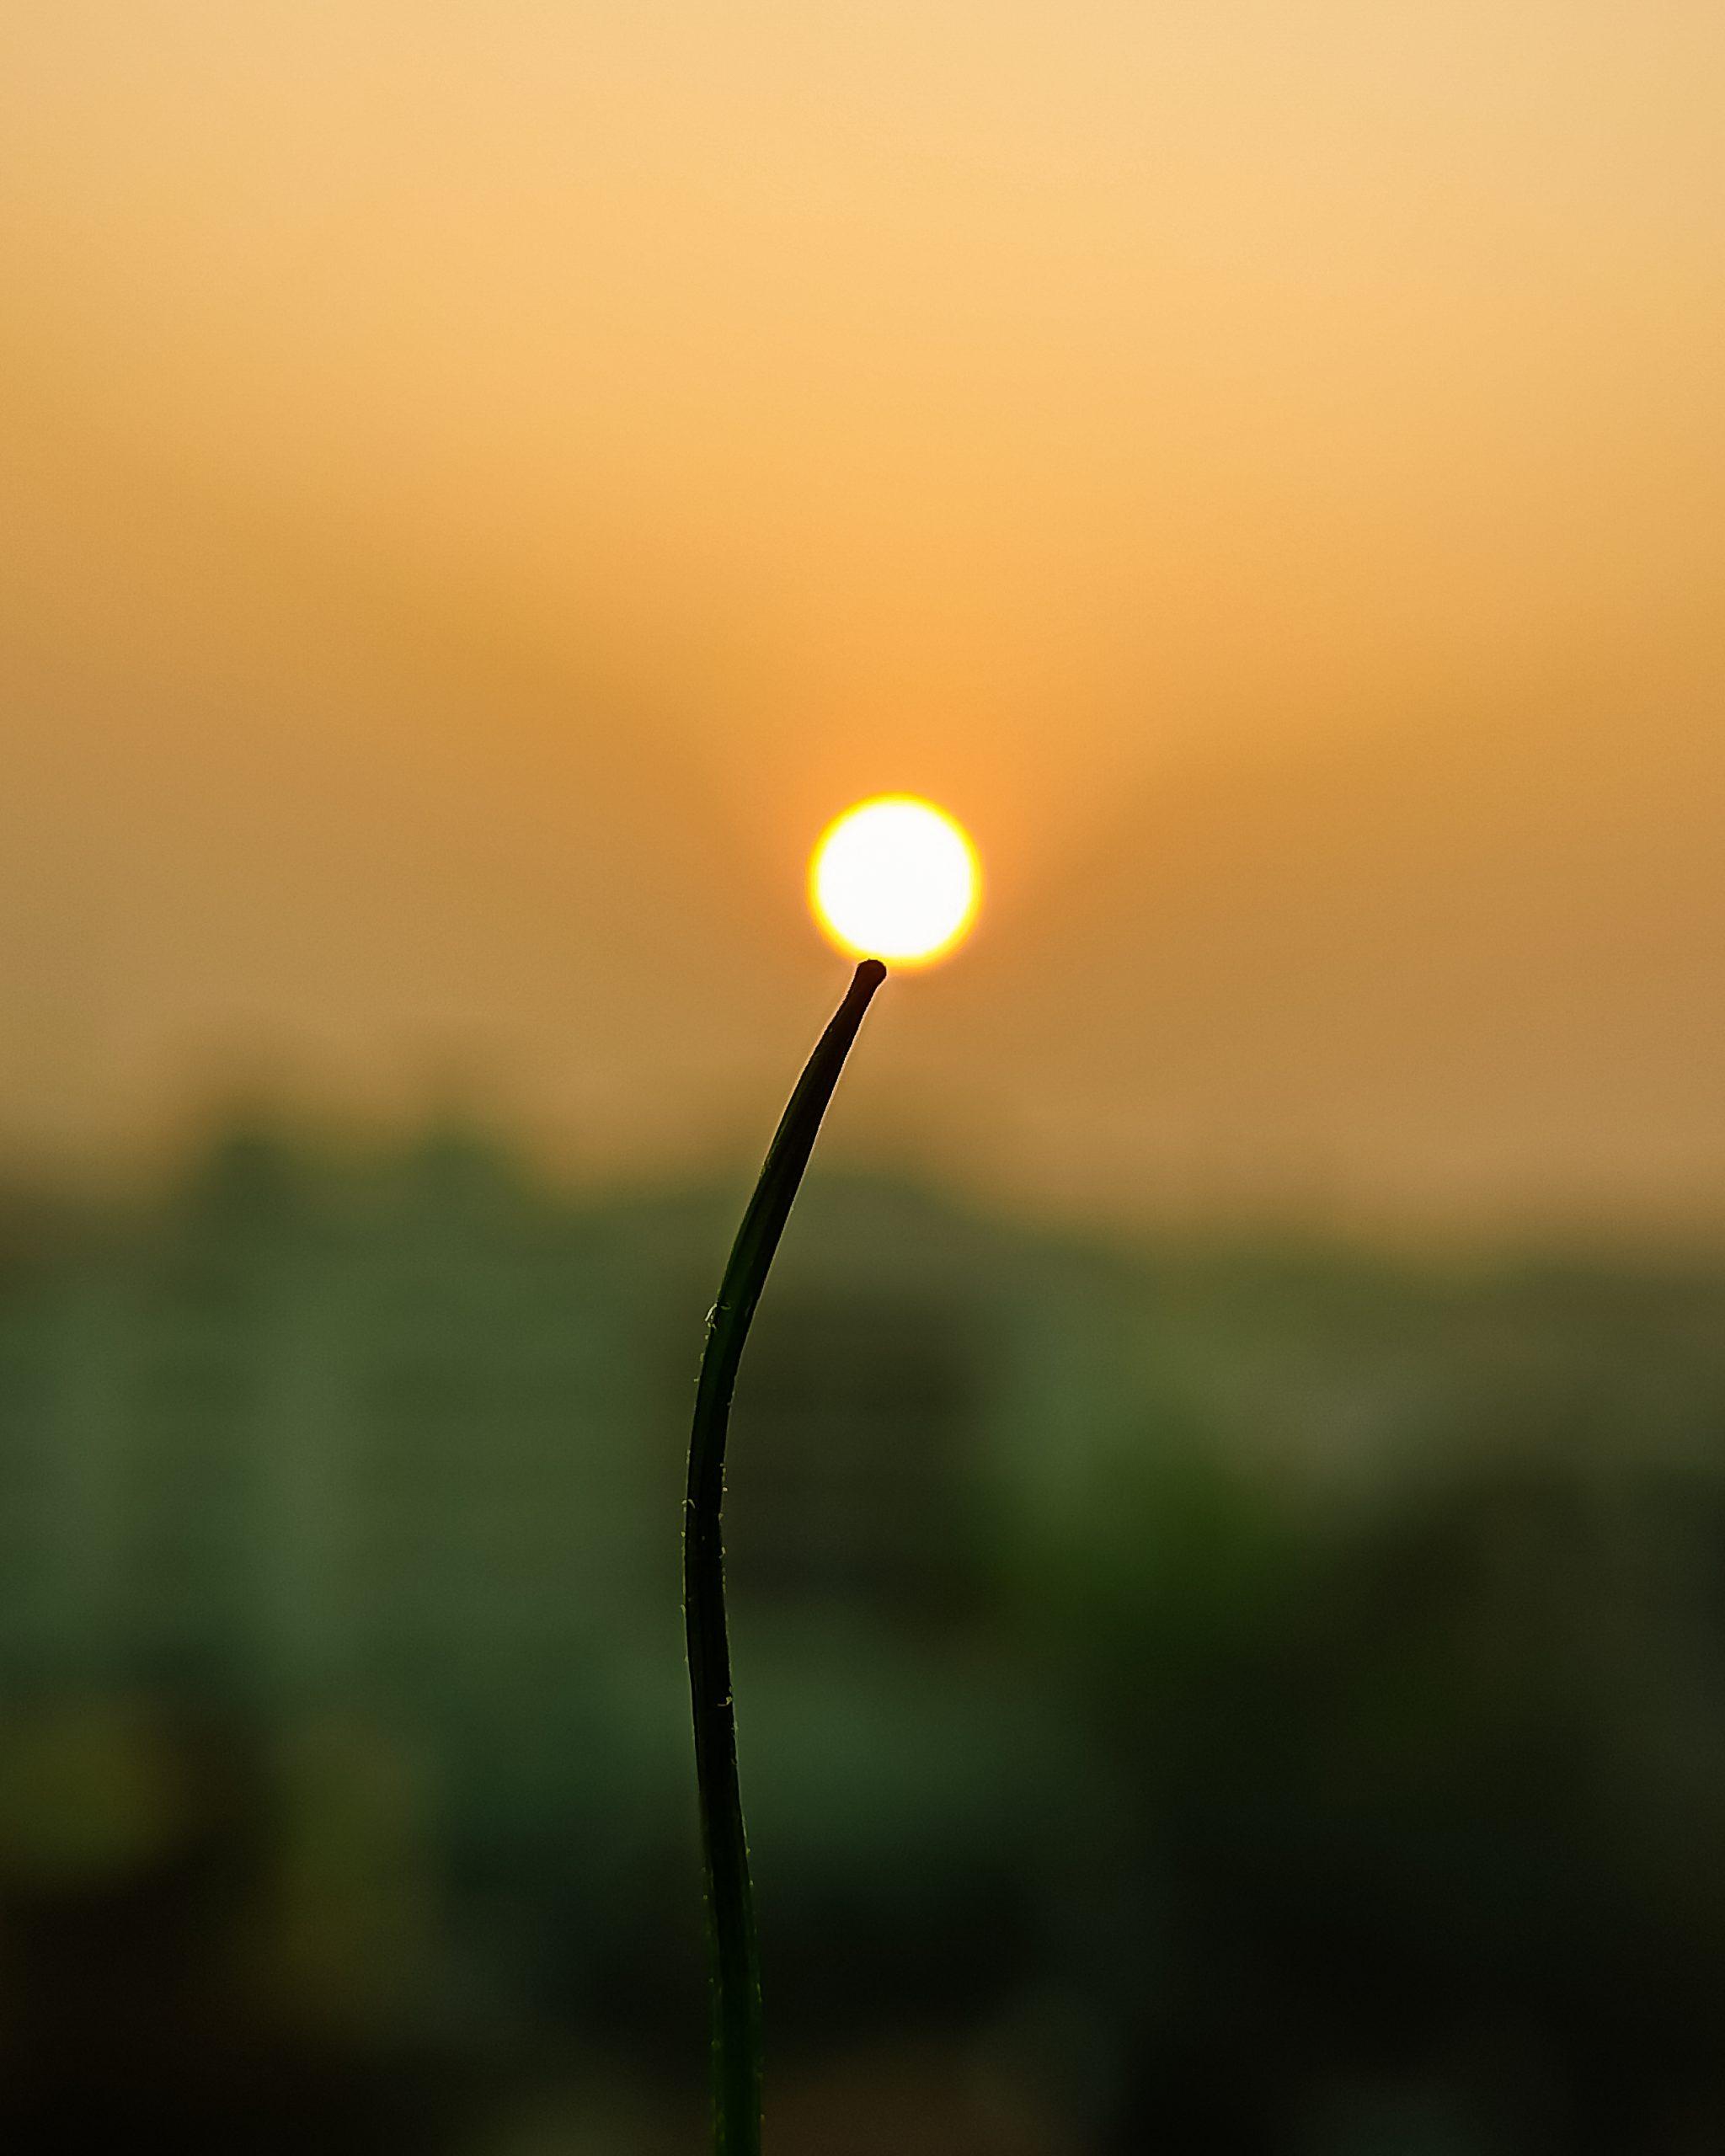 Sunset view through plant stem